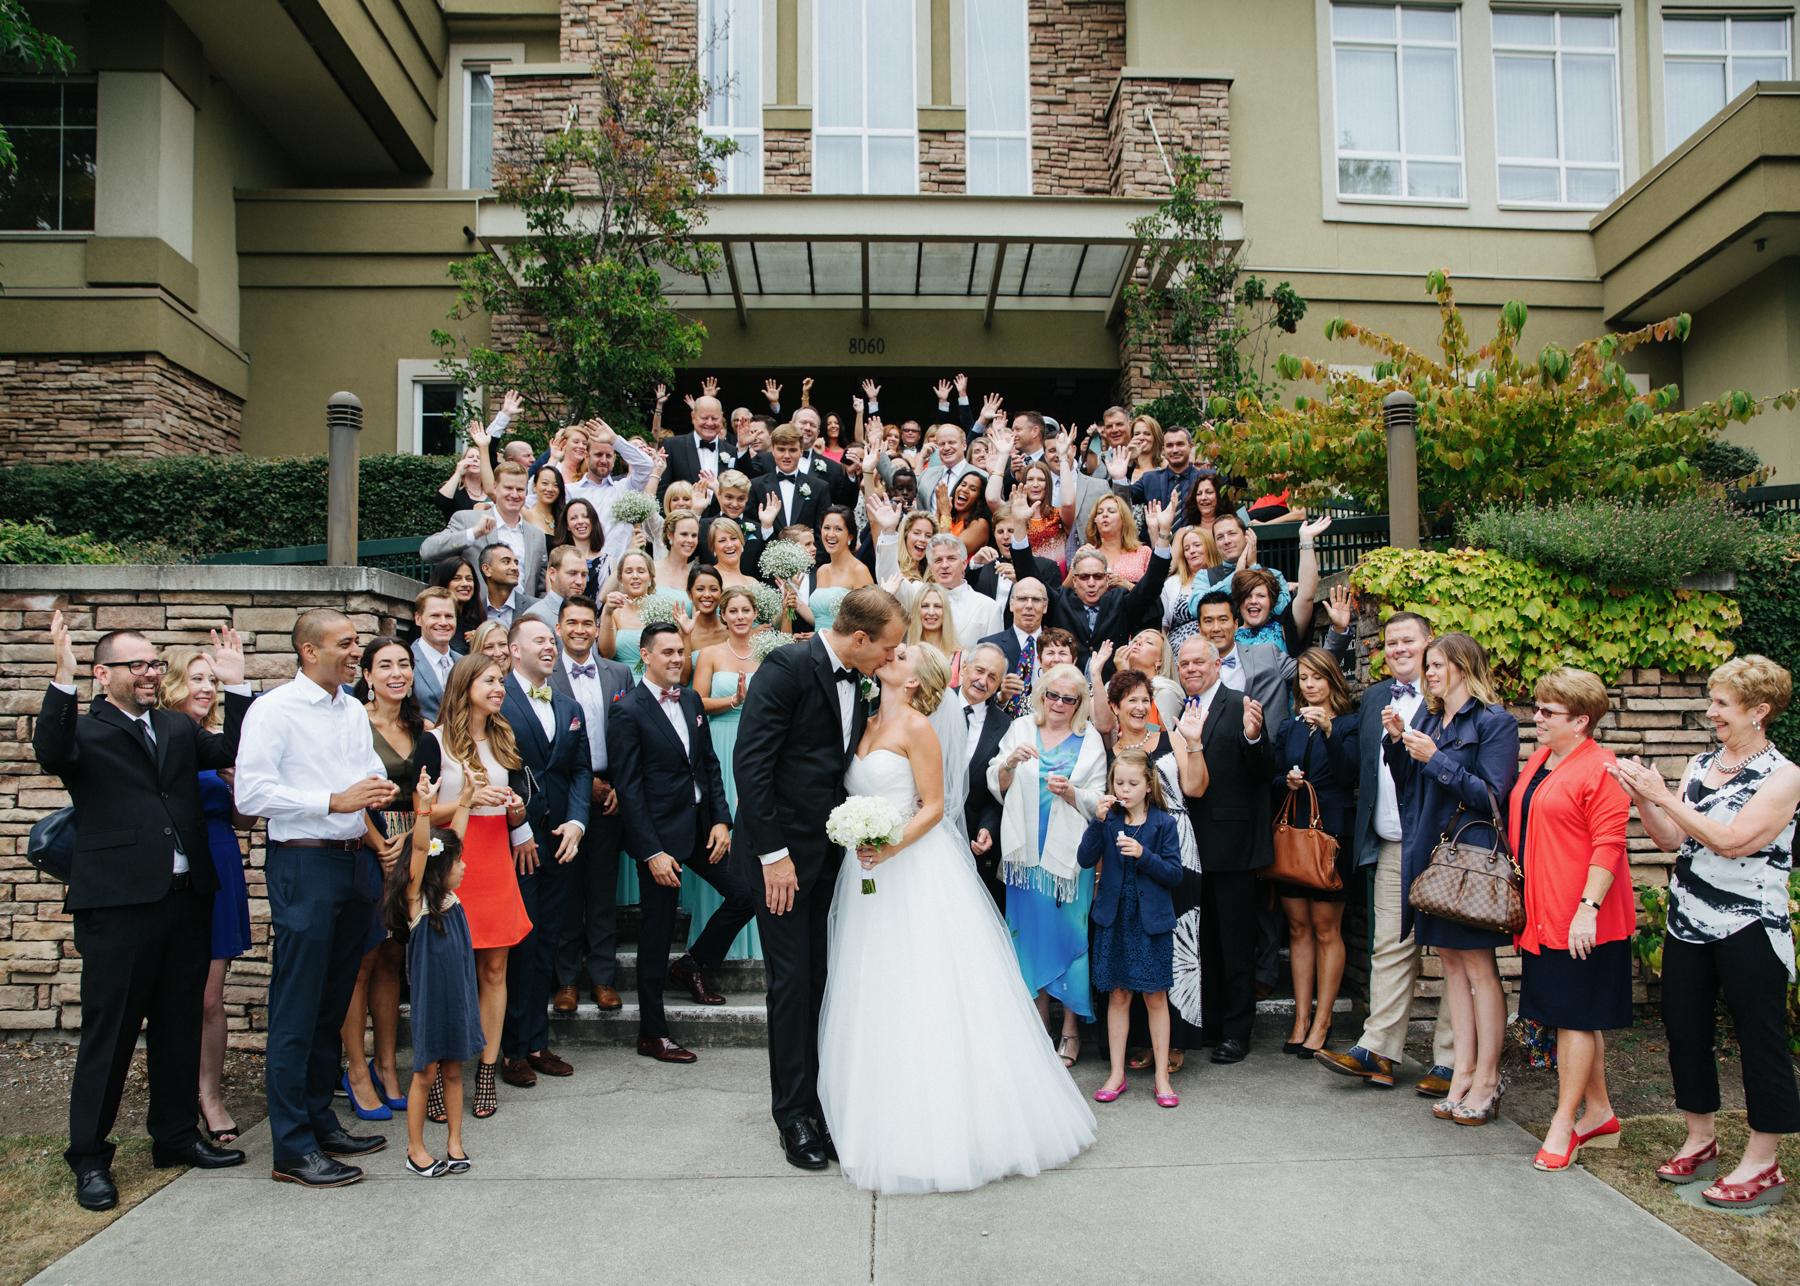 kaoverii_silva_photographer_via-herafilms_kelly_mike_wedding-12.jpg